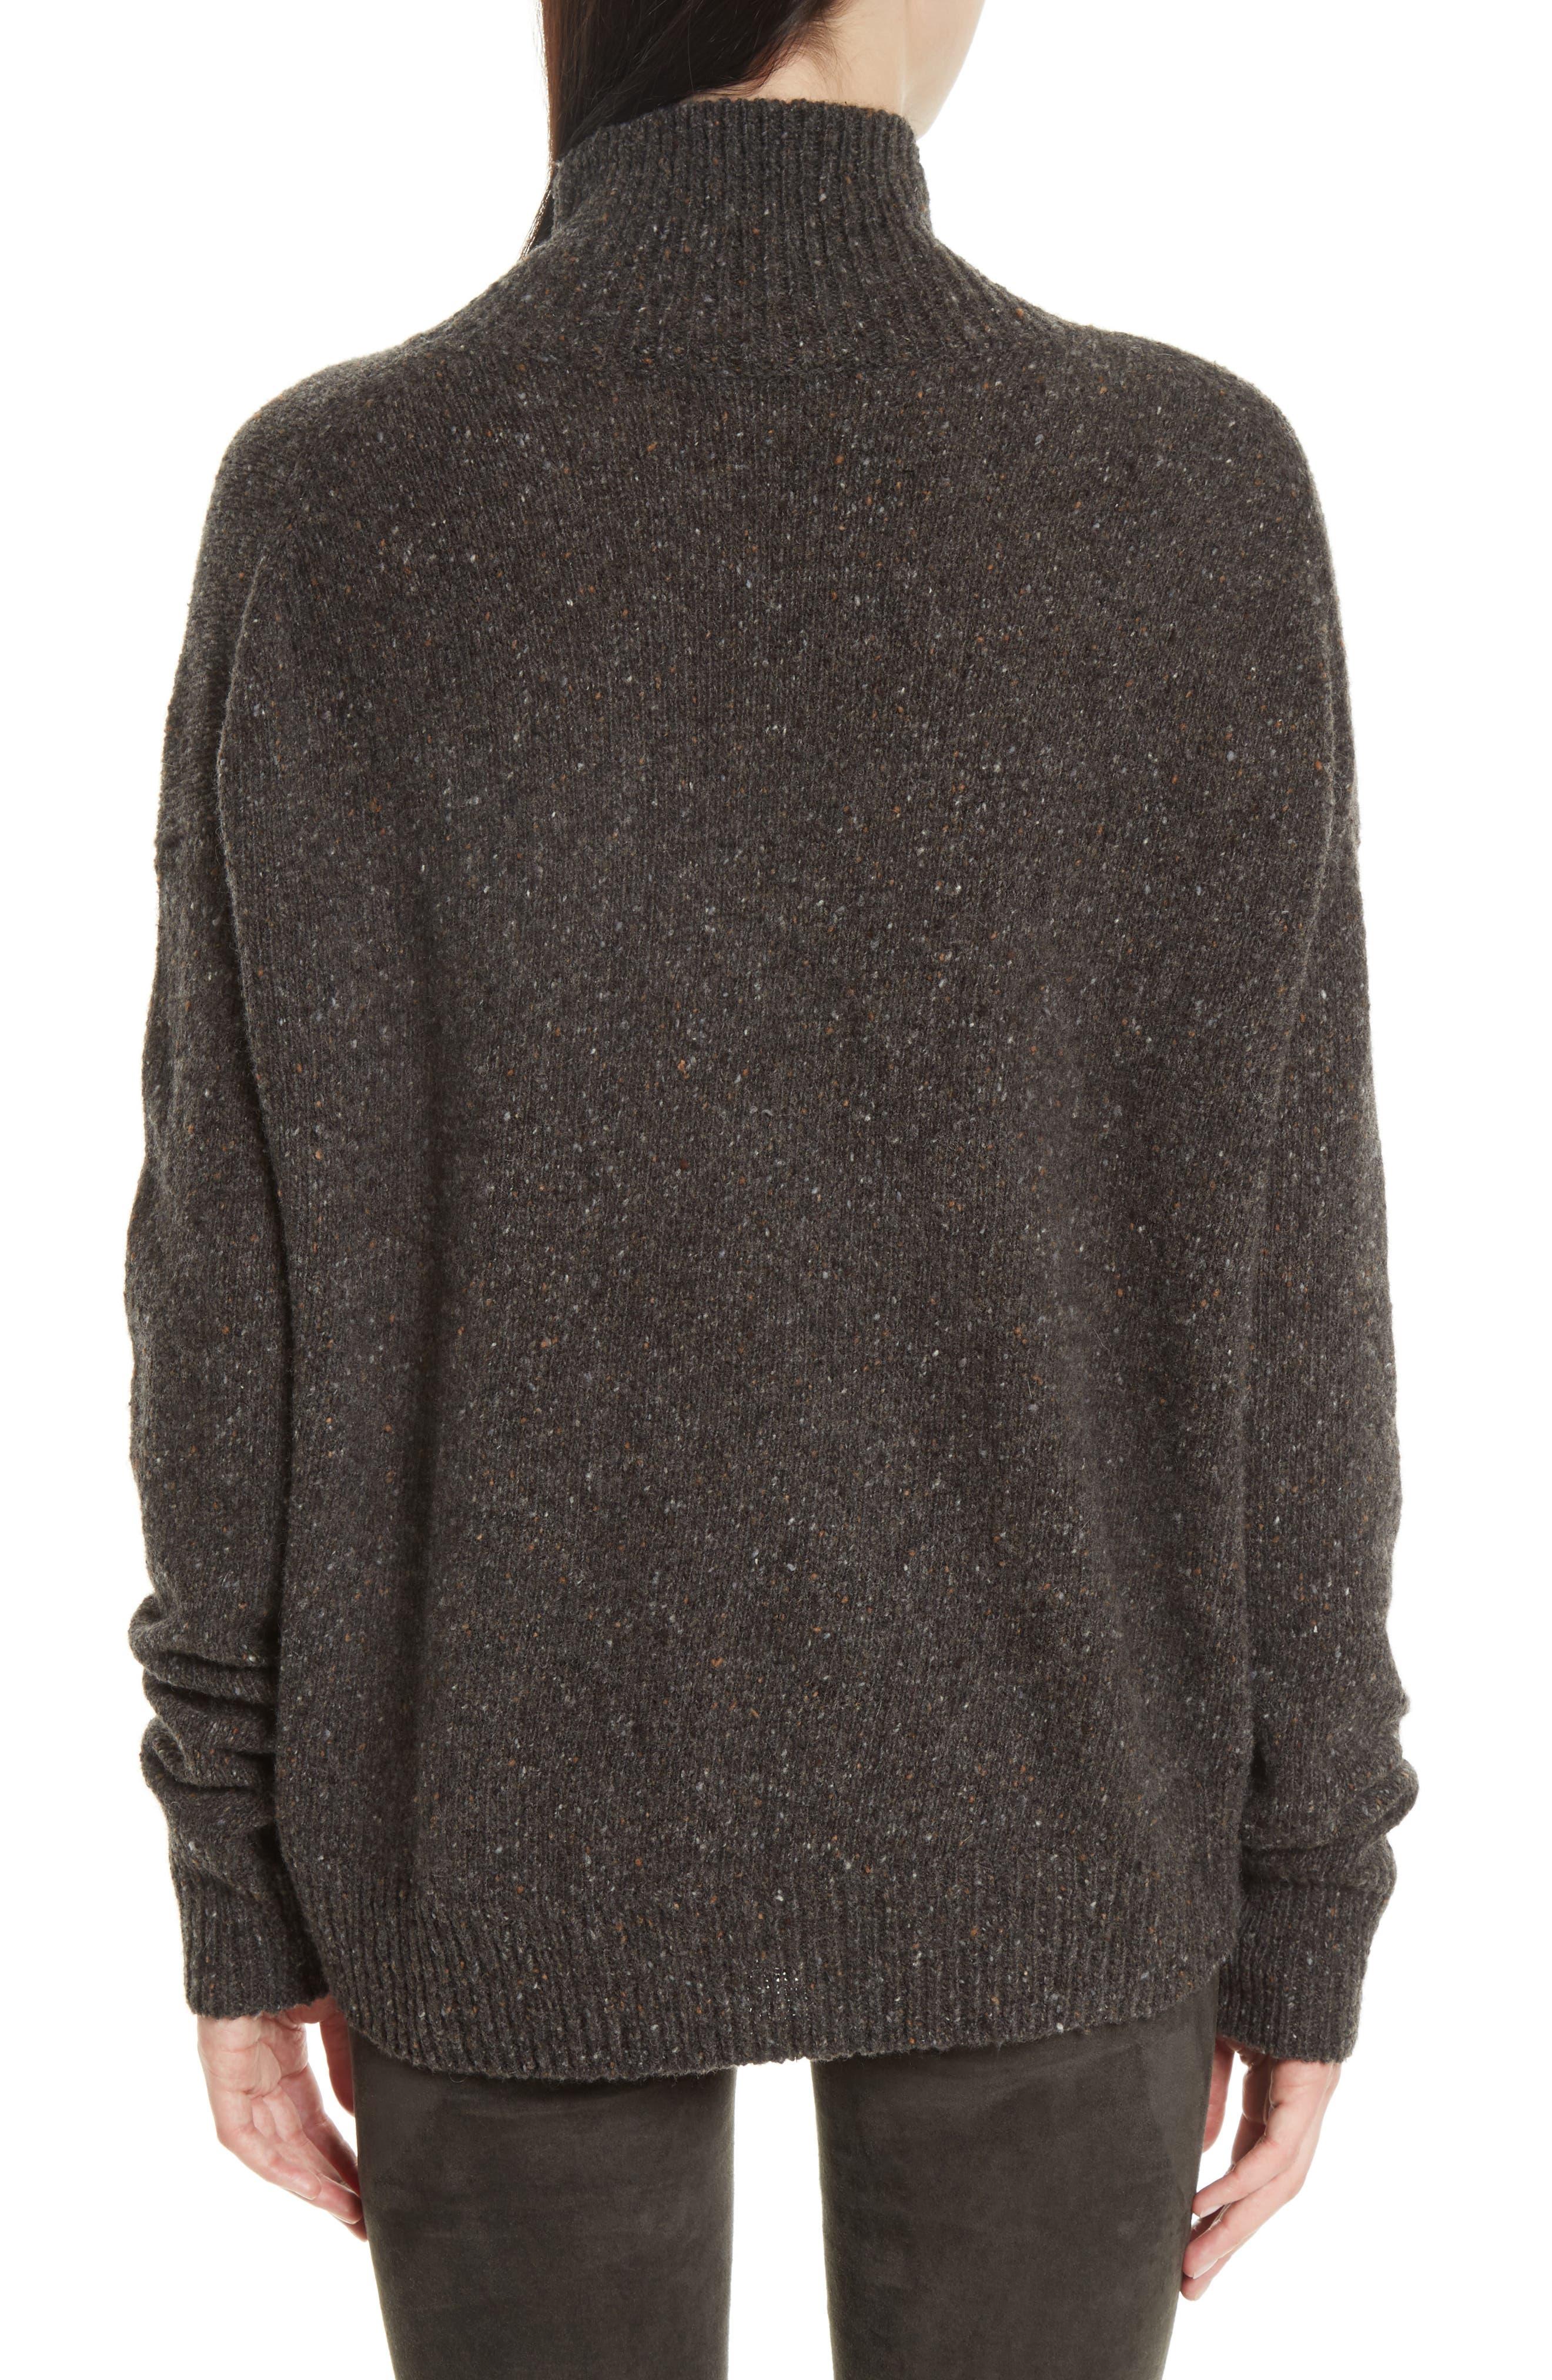 Cashmere Turtleneck Sweater,                             Alternate thumbnail 2, color,                             060